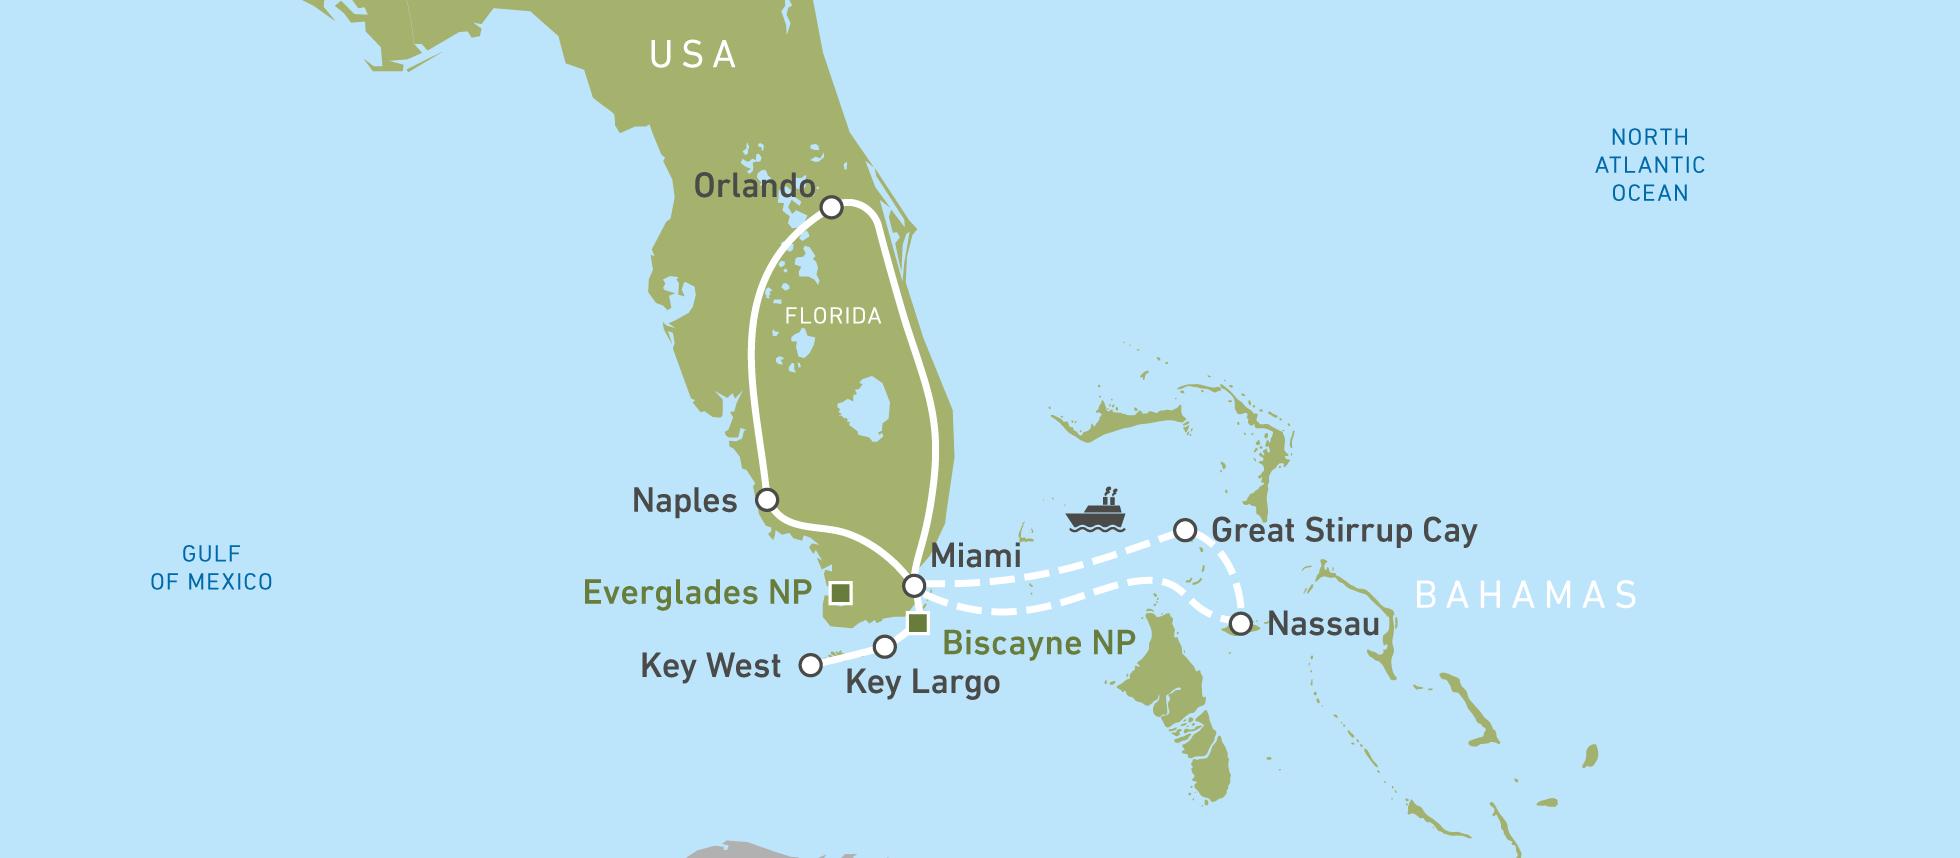 Florida & Bahamas: Urlaub am Golf von Mexiko! | CANUSA